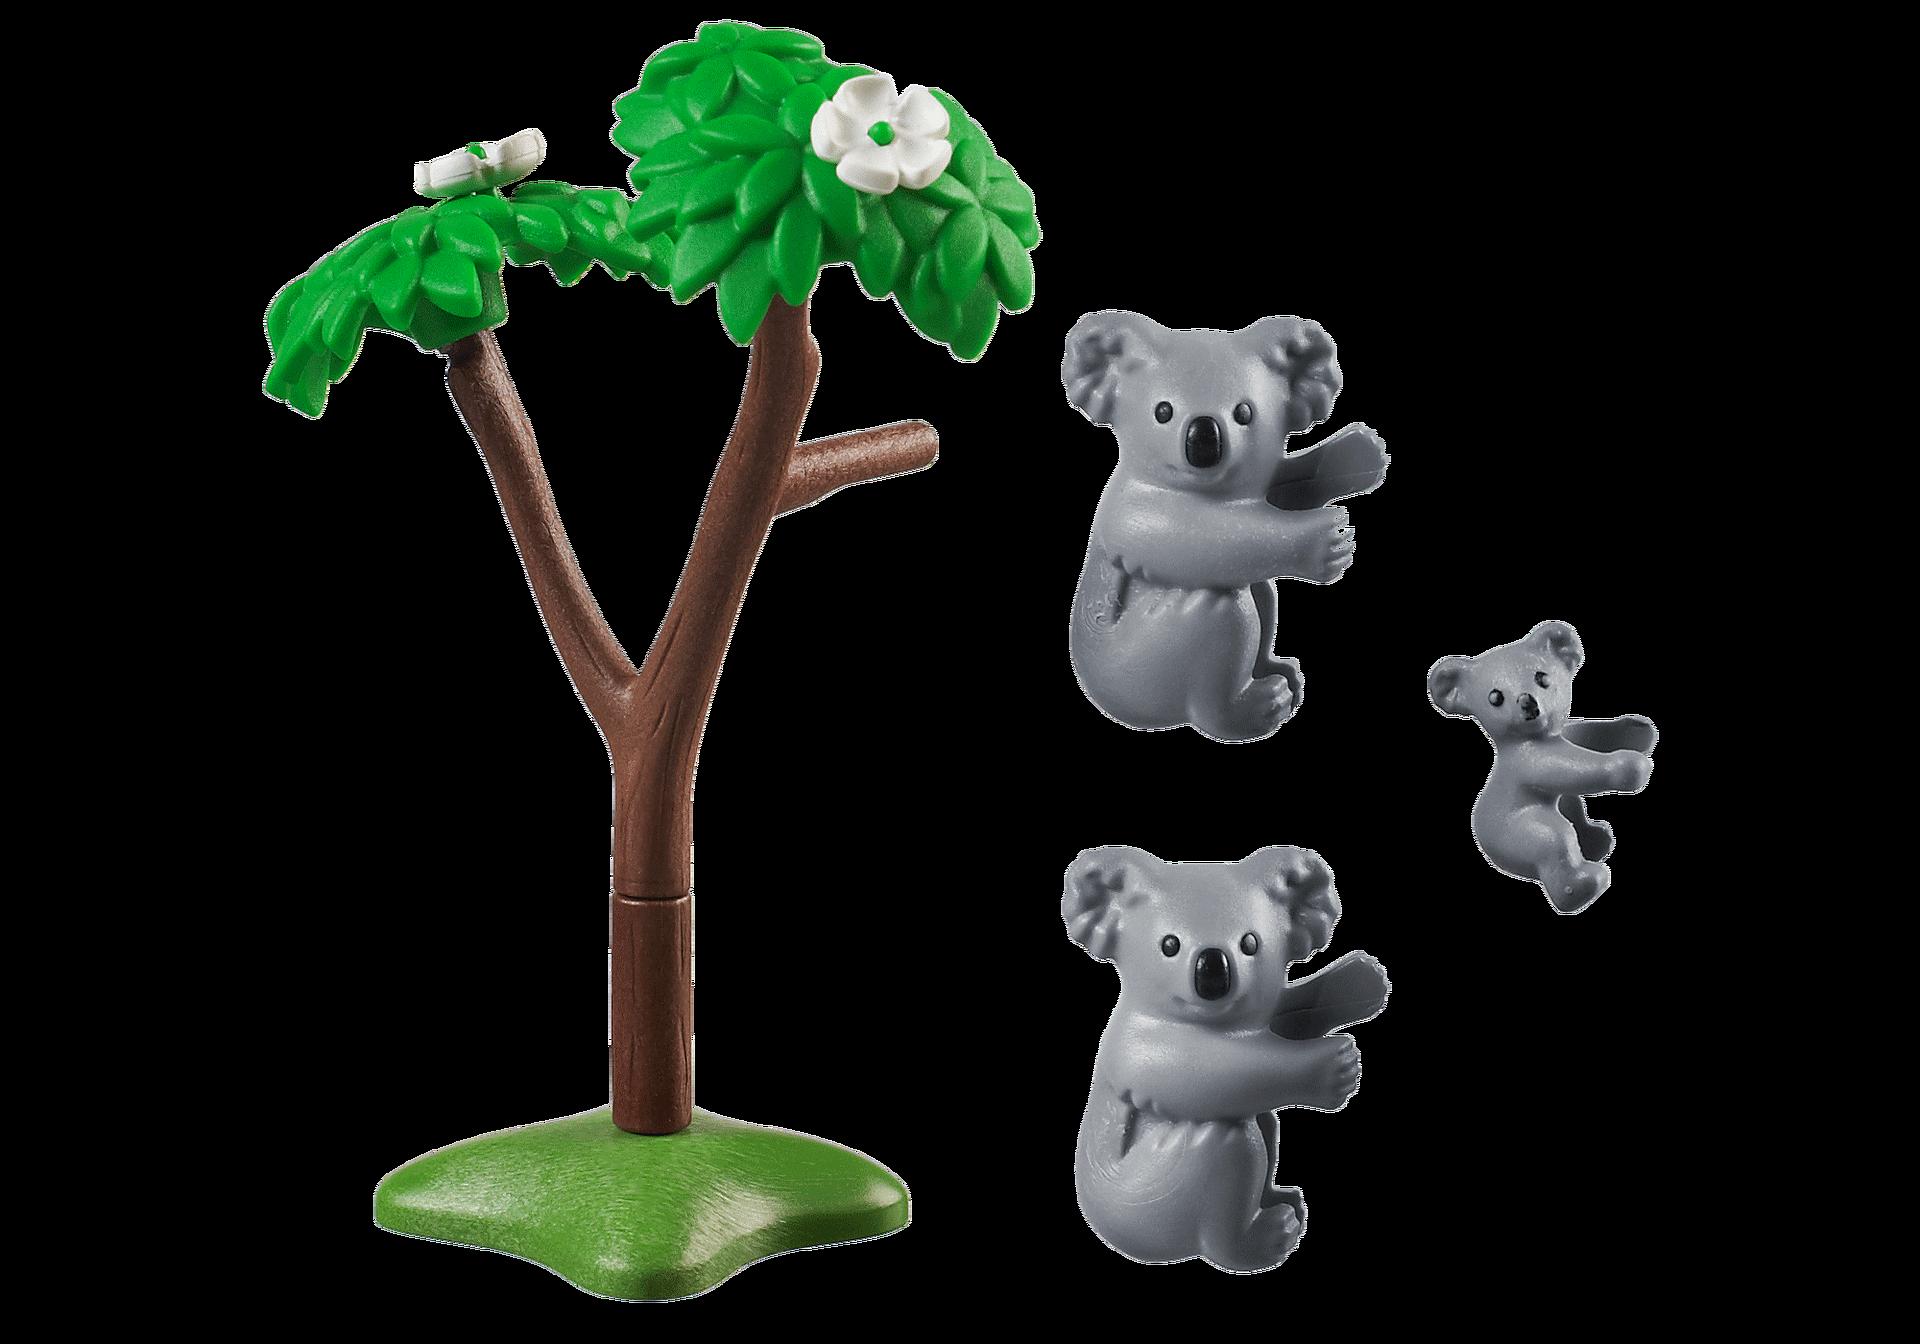 70352 Famiglia di Koala zoom image3